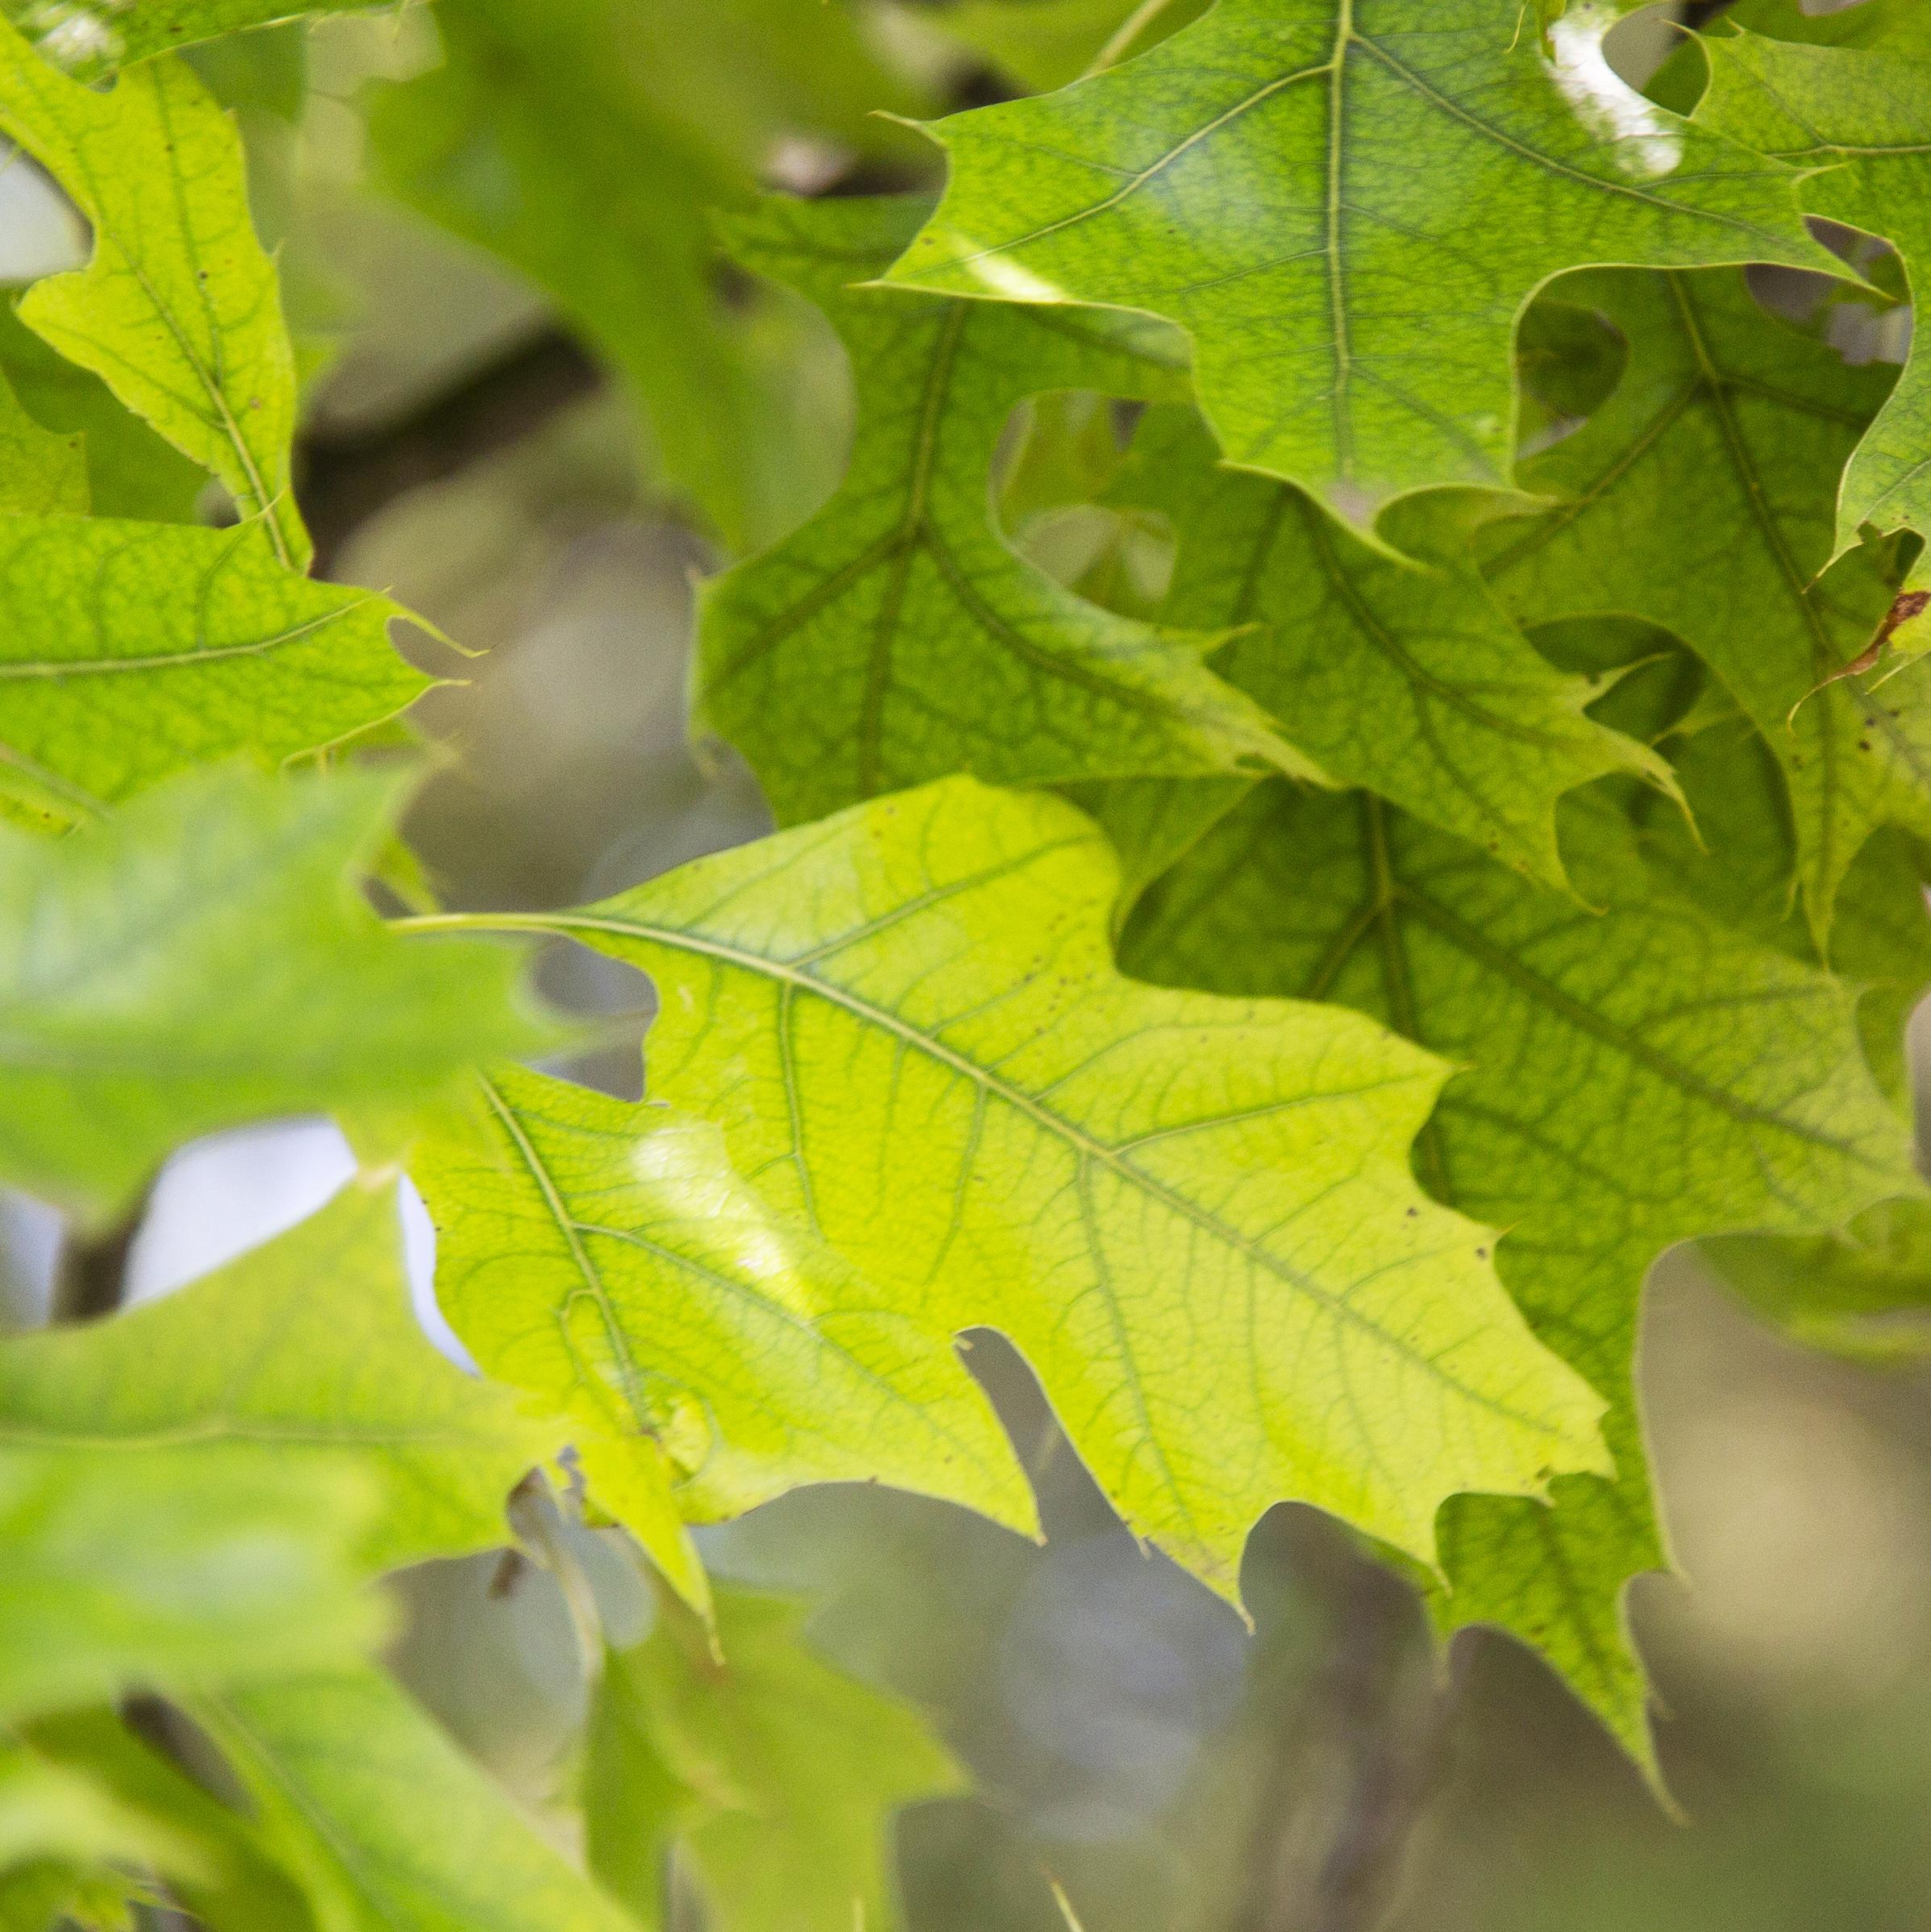 Chlorosis in a Pin Oak in Bexley, Ohio